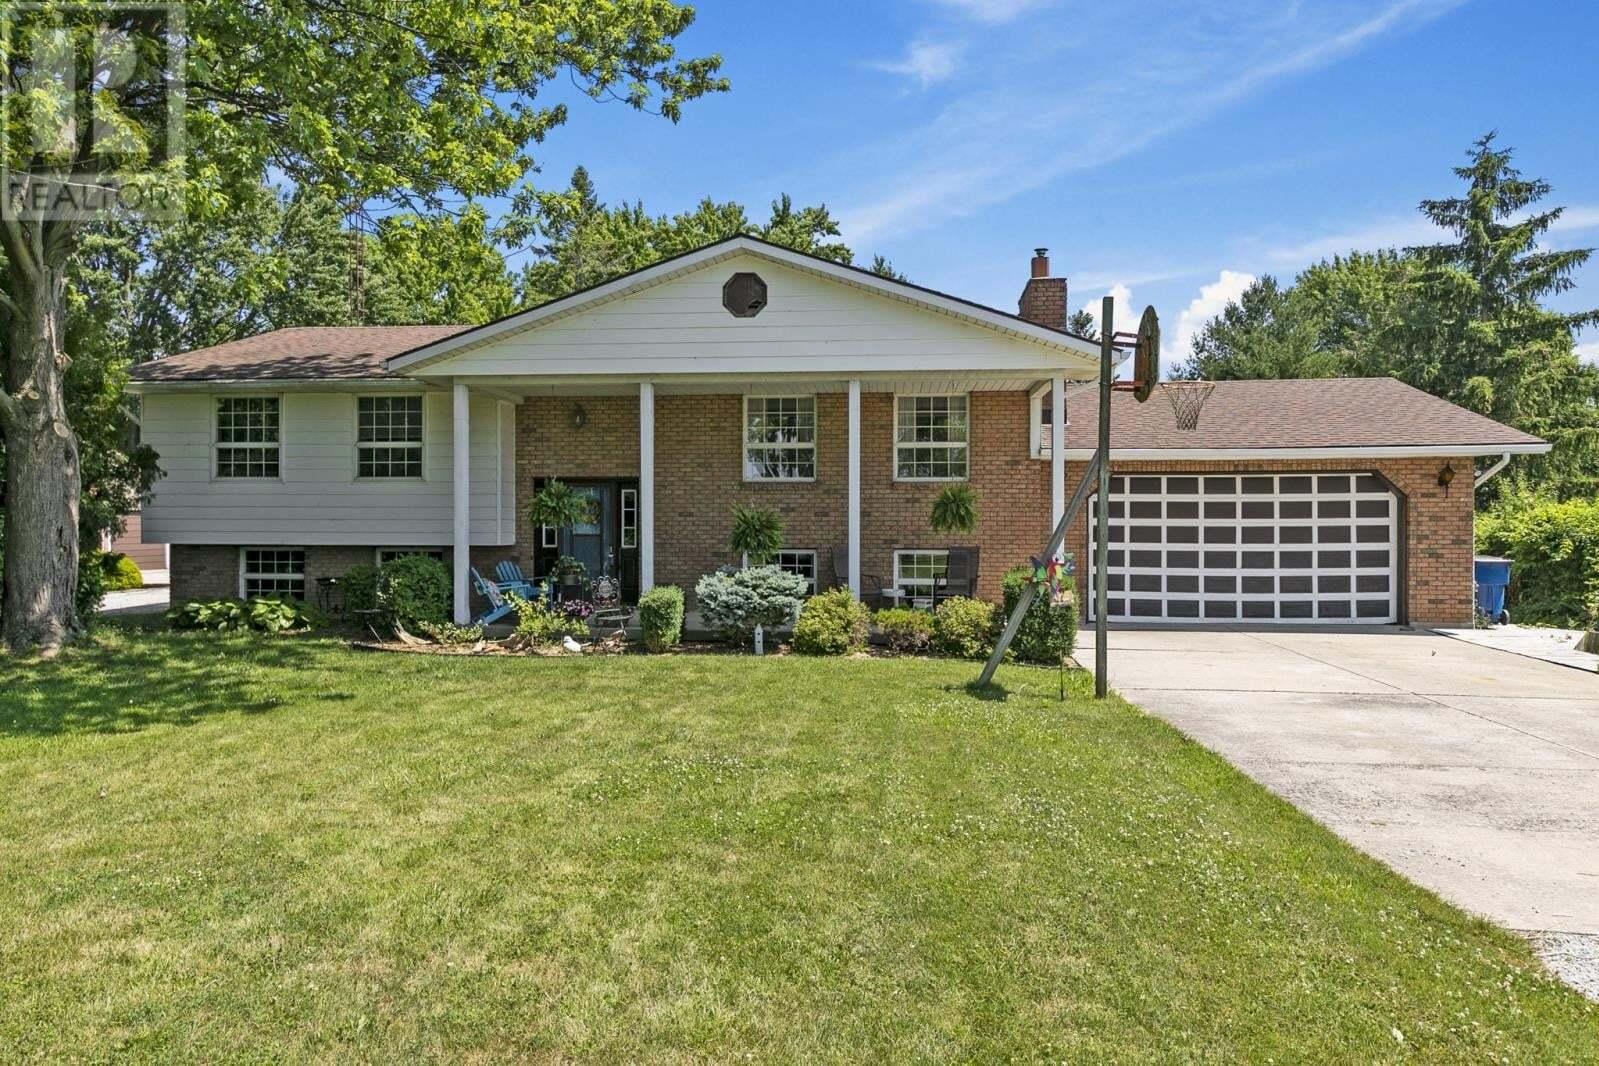 House for sale at 20257 Klondyke  Wheatley Ontario - MLS: 20008331